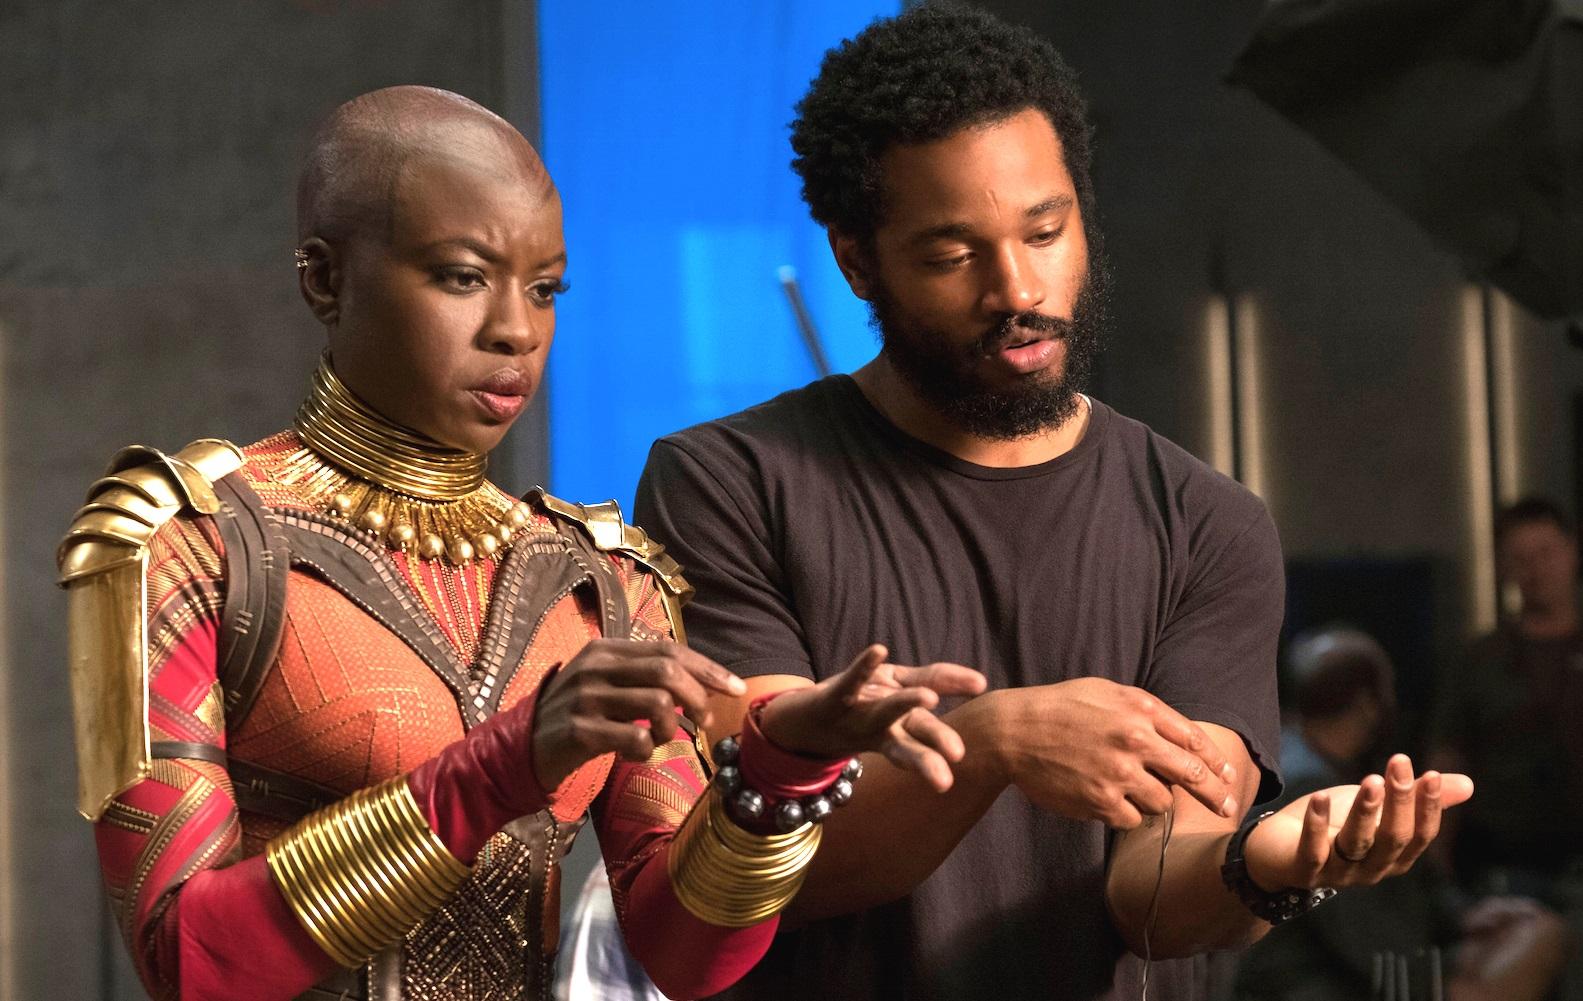 Ryan Coogler on the set of Black Panther with Lupita Nyong'o's character Nakia